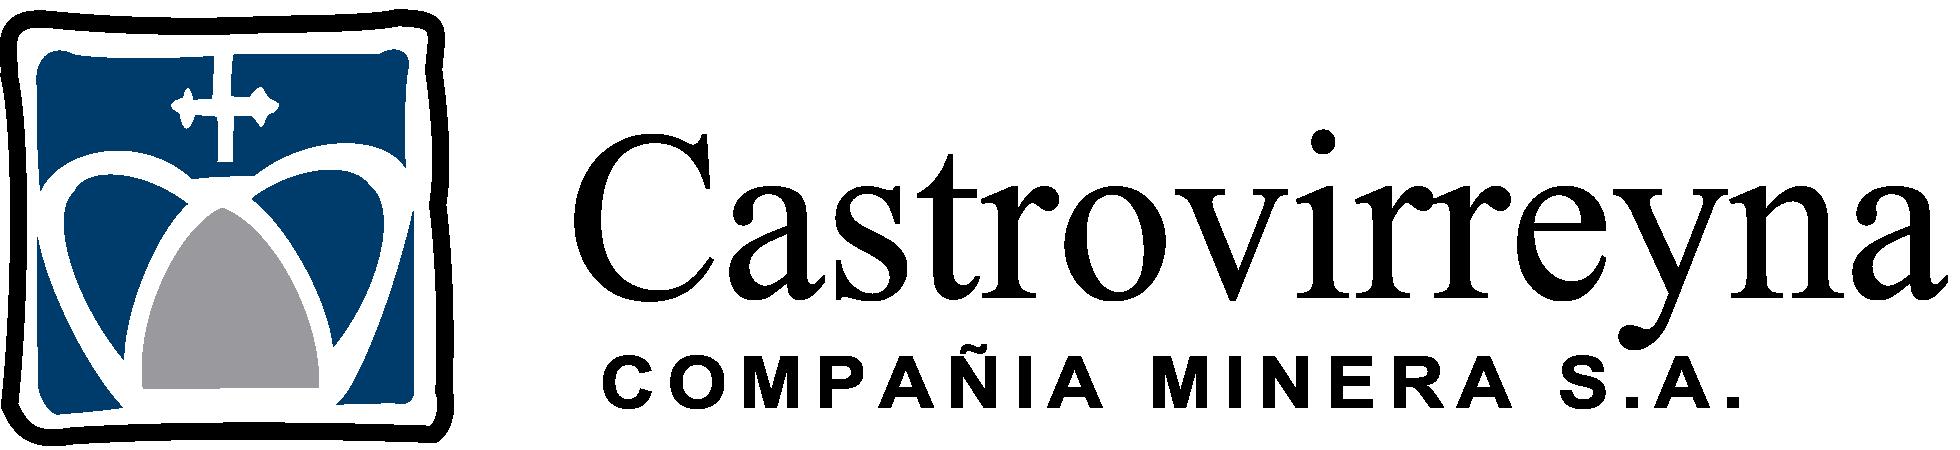 Minera Castrovirreyna